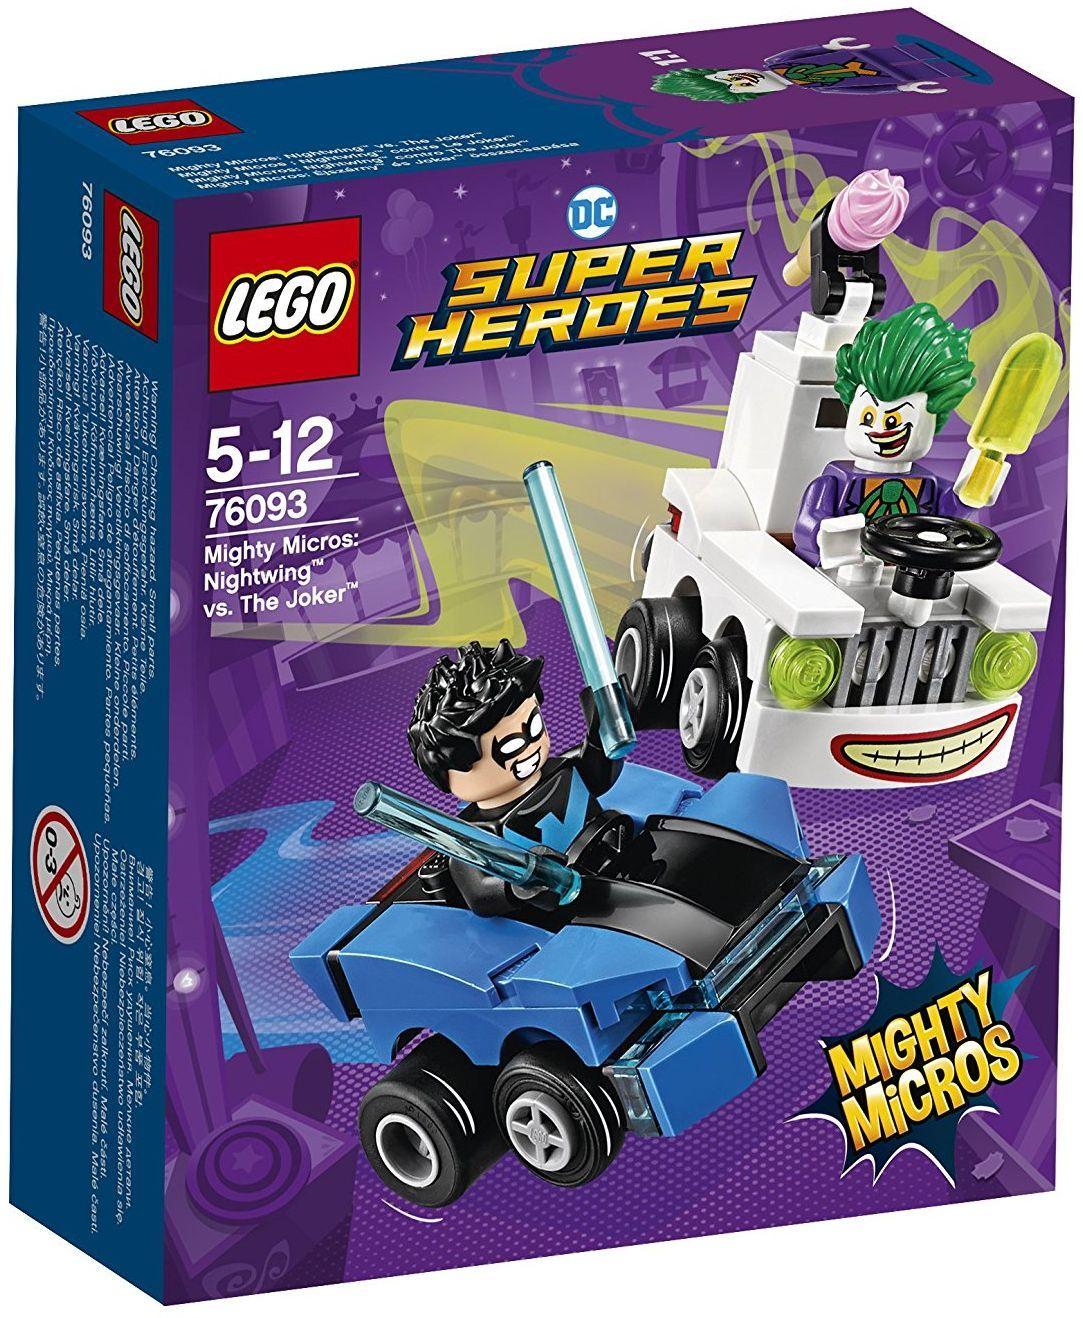 Конструктор Lego Super Heroes - Mighty Micros: Nightwing™ vs. The Joker™ (76093) - 1